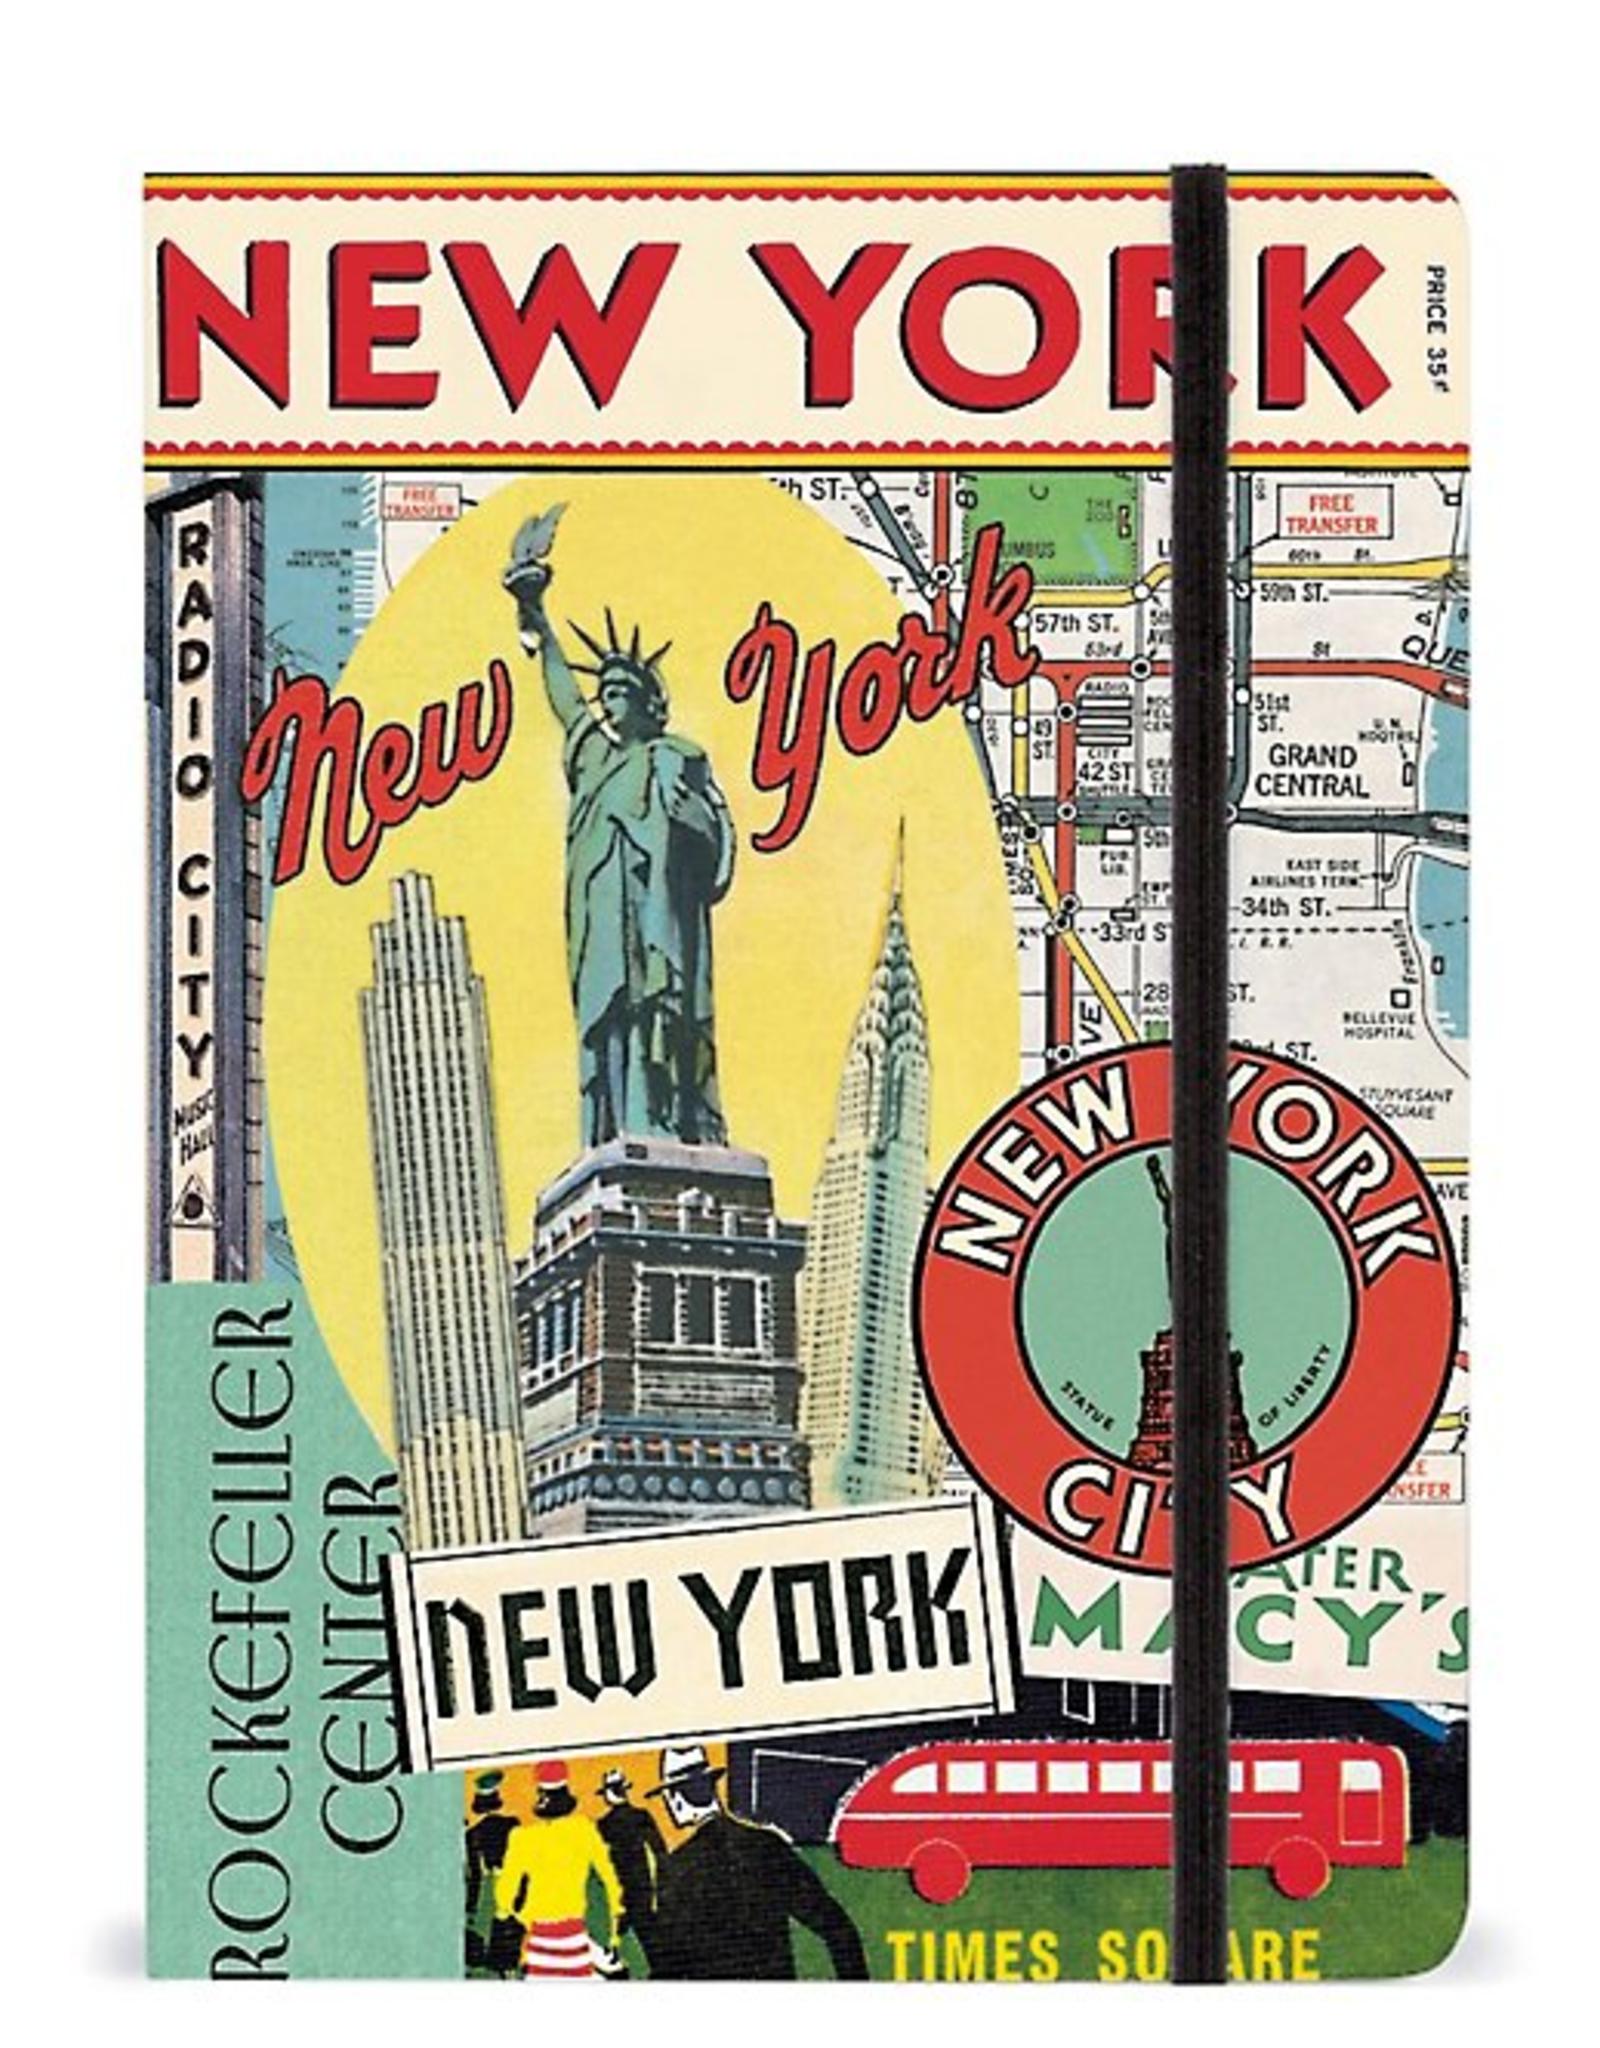 Vintage NYC notebook 6x8